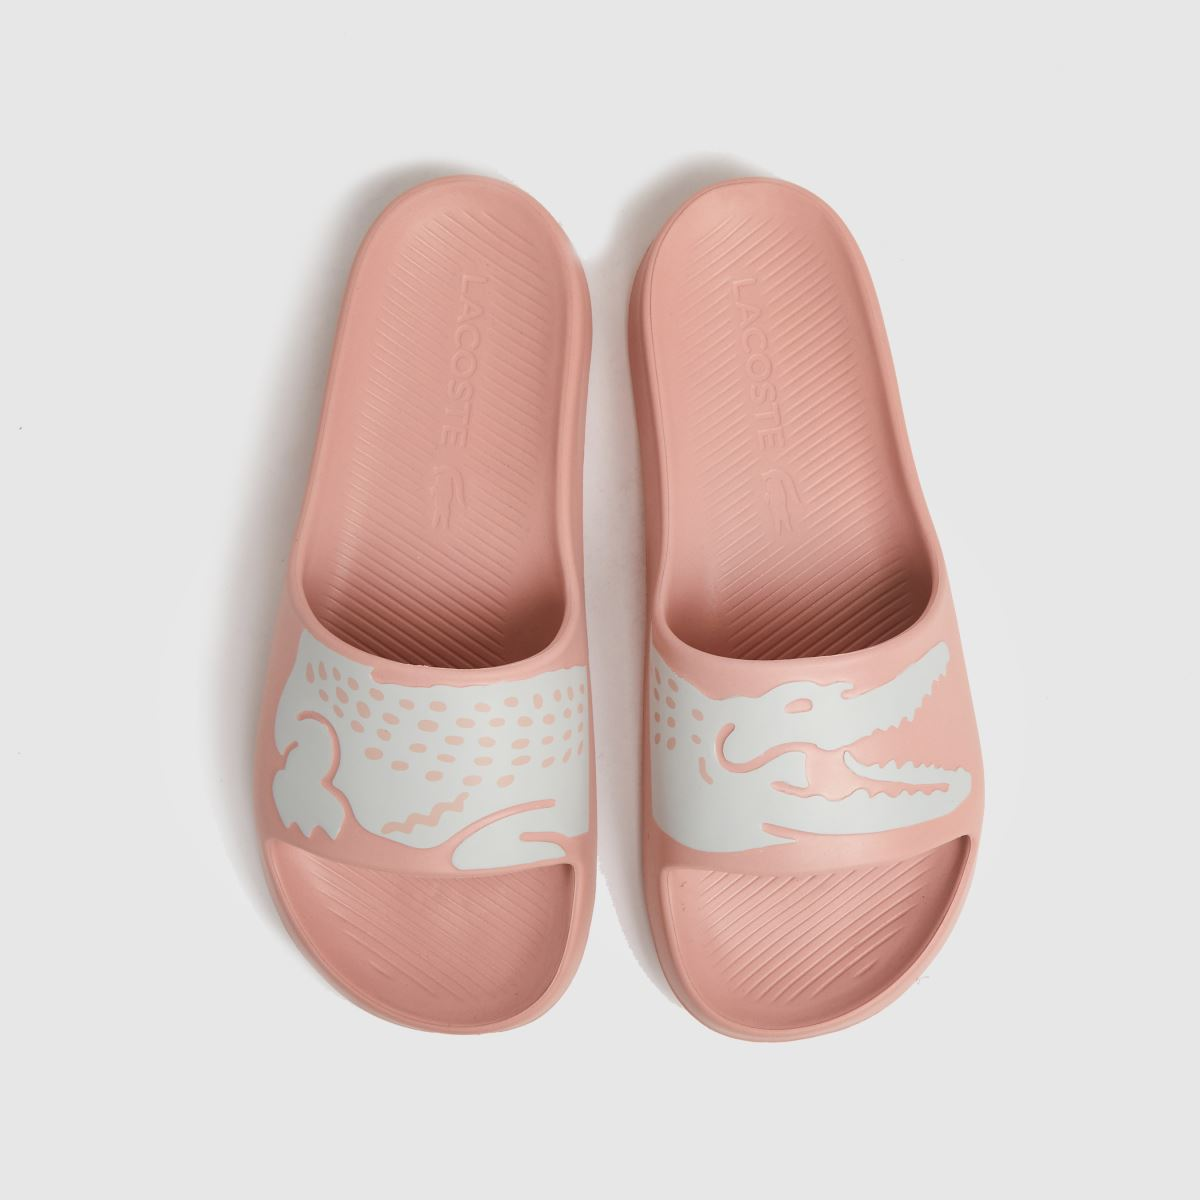 Lacoste Pale Pink Croco Slide 2.0 Sandals